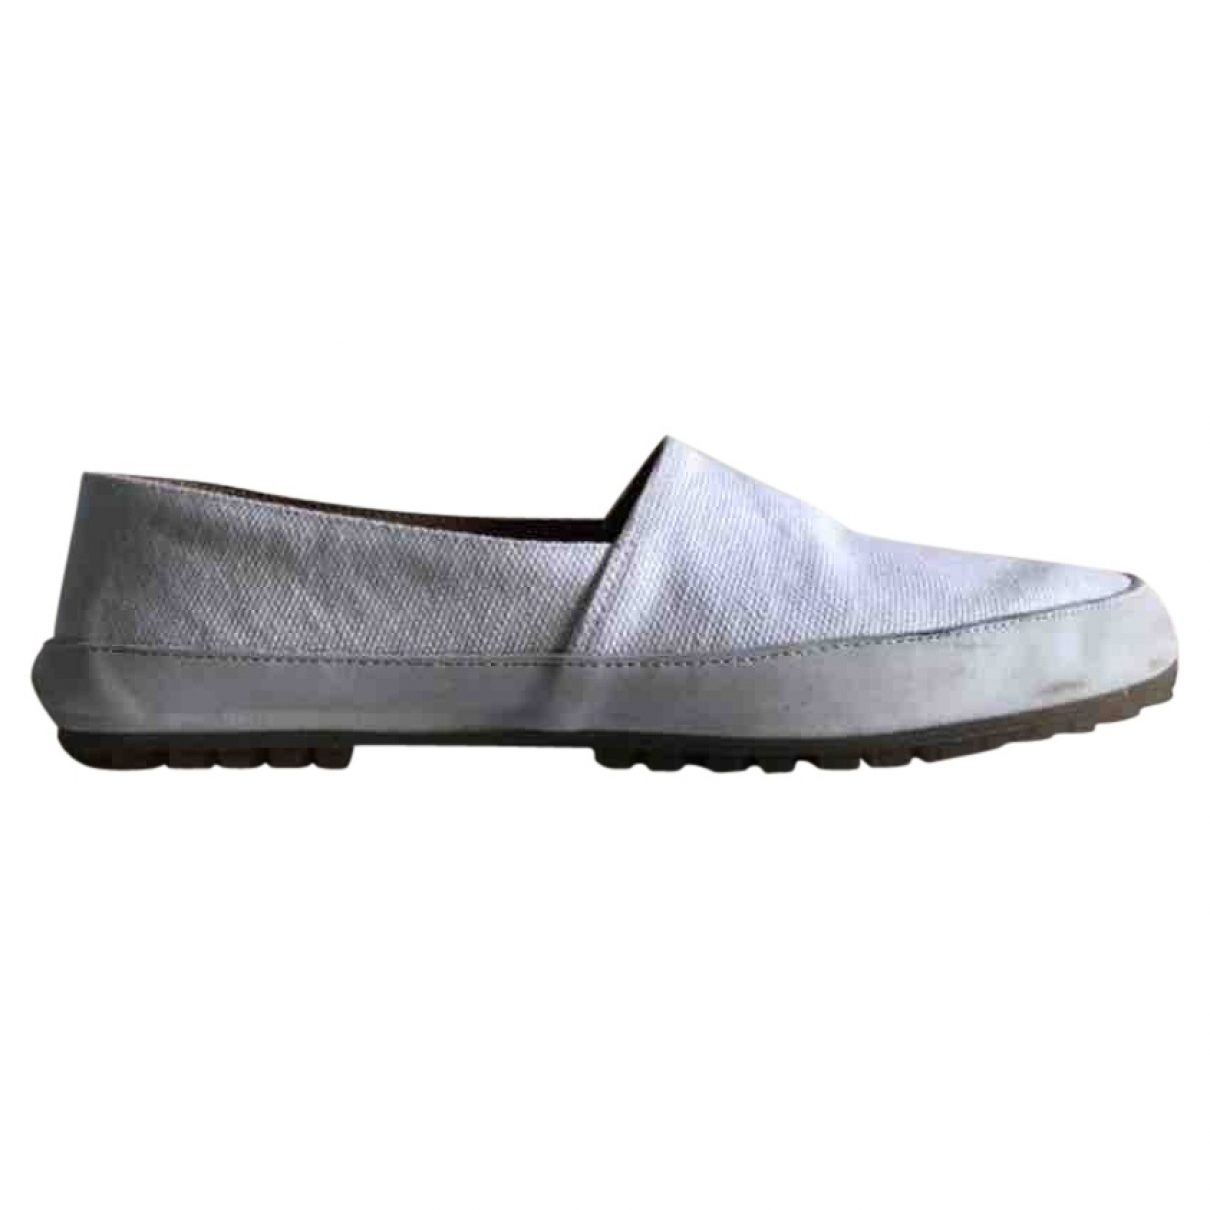 Maison Martin Margiela \N White Cloth Espadrilles for Women 39 IT